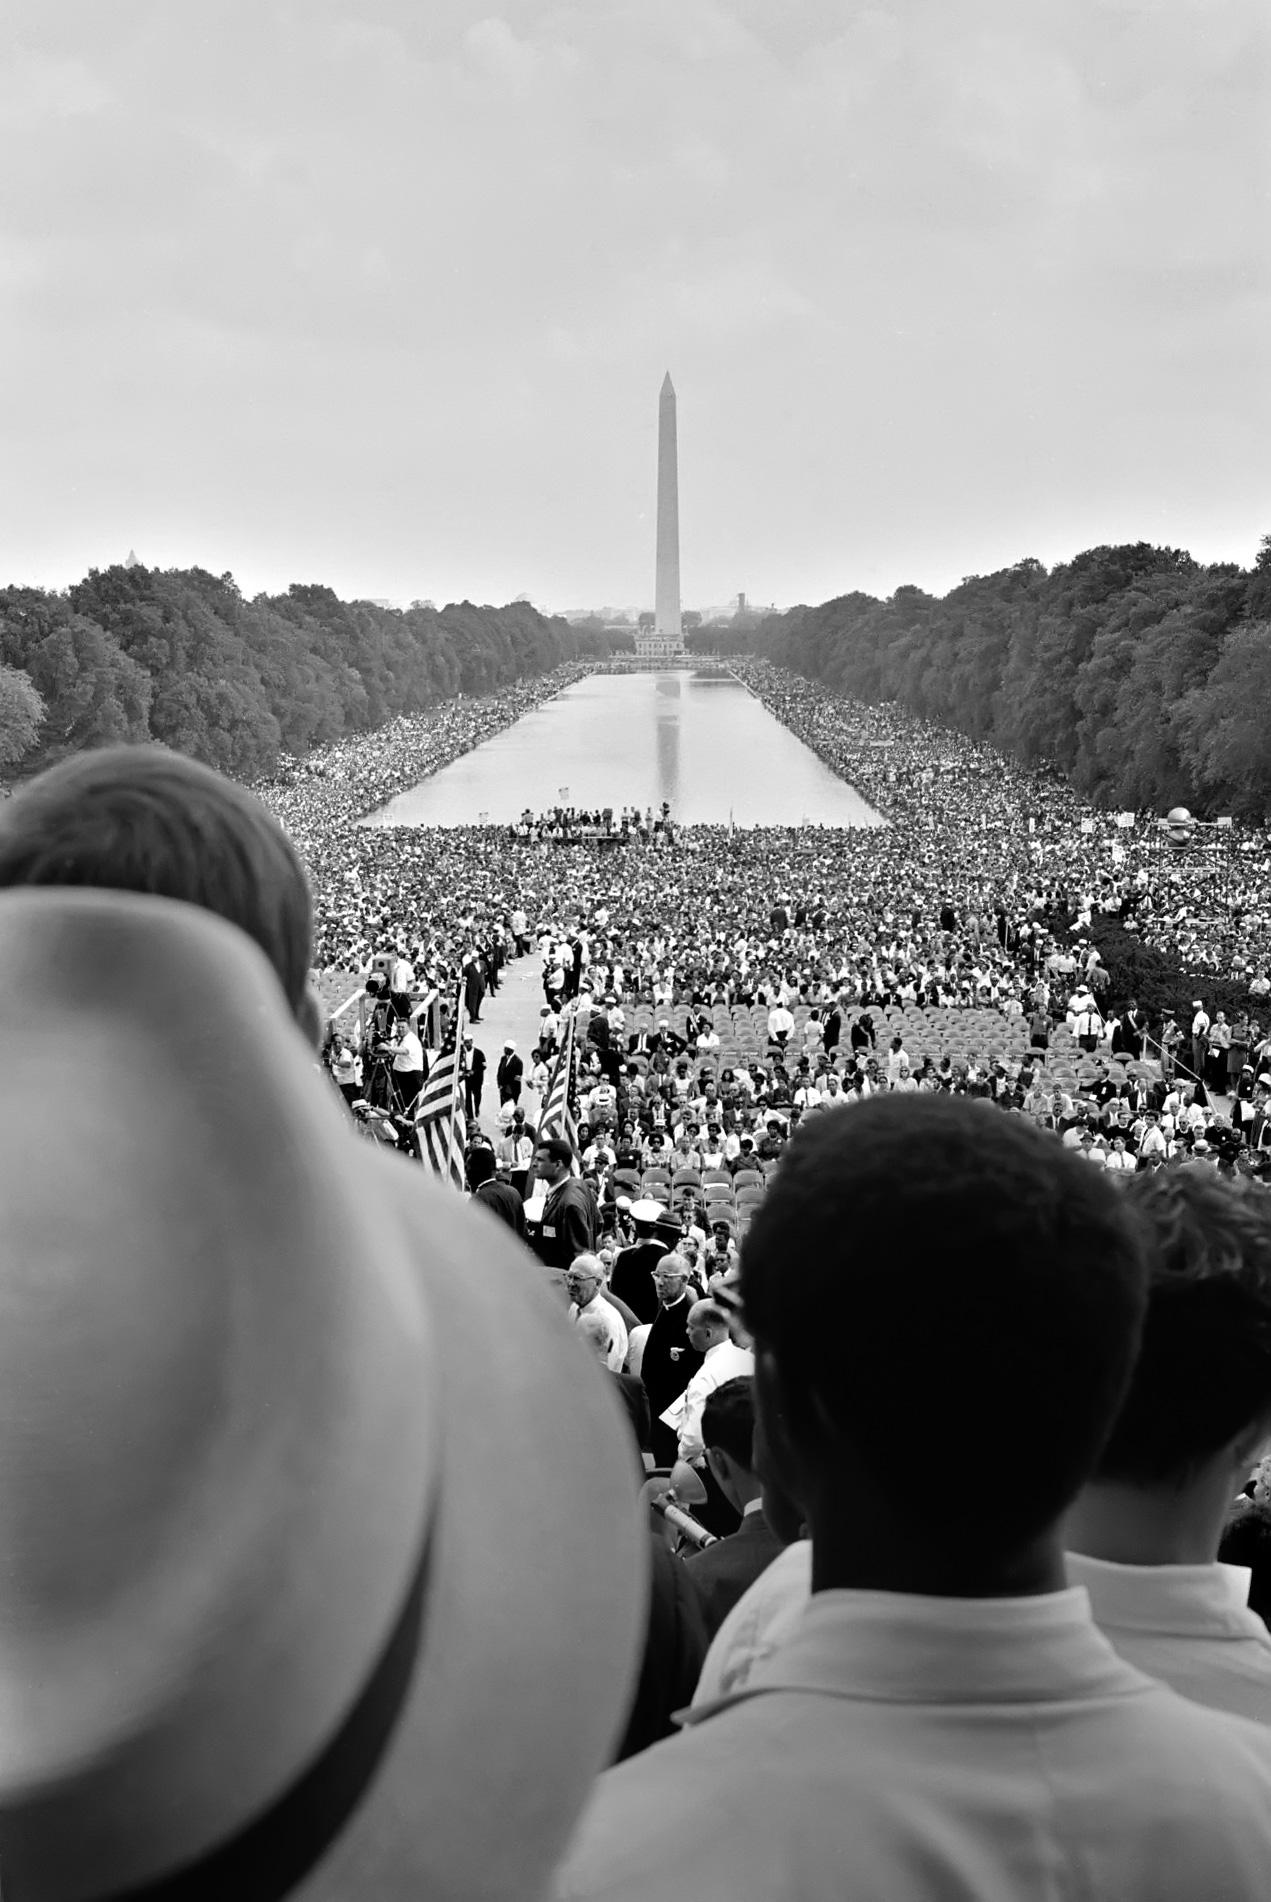 March_on_Washington_edit